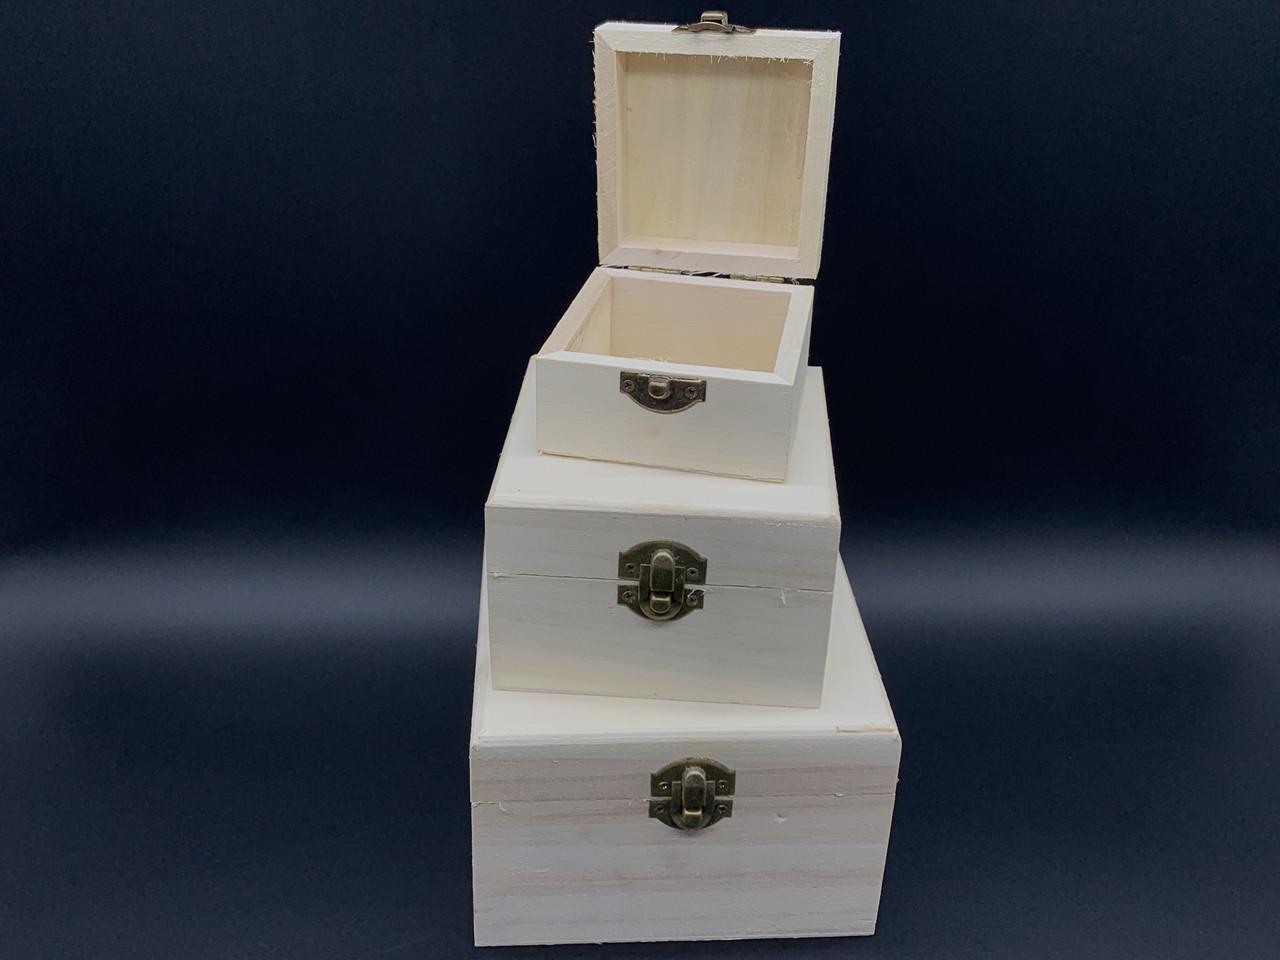 Шкатулка для декупажа с замком и петлями. Три шт/комплект. 14х14х9см